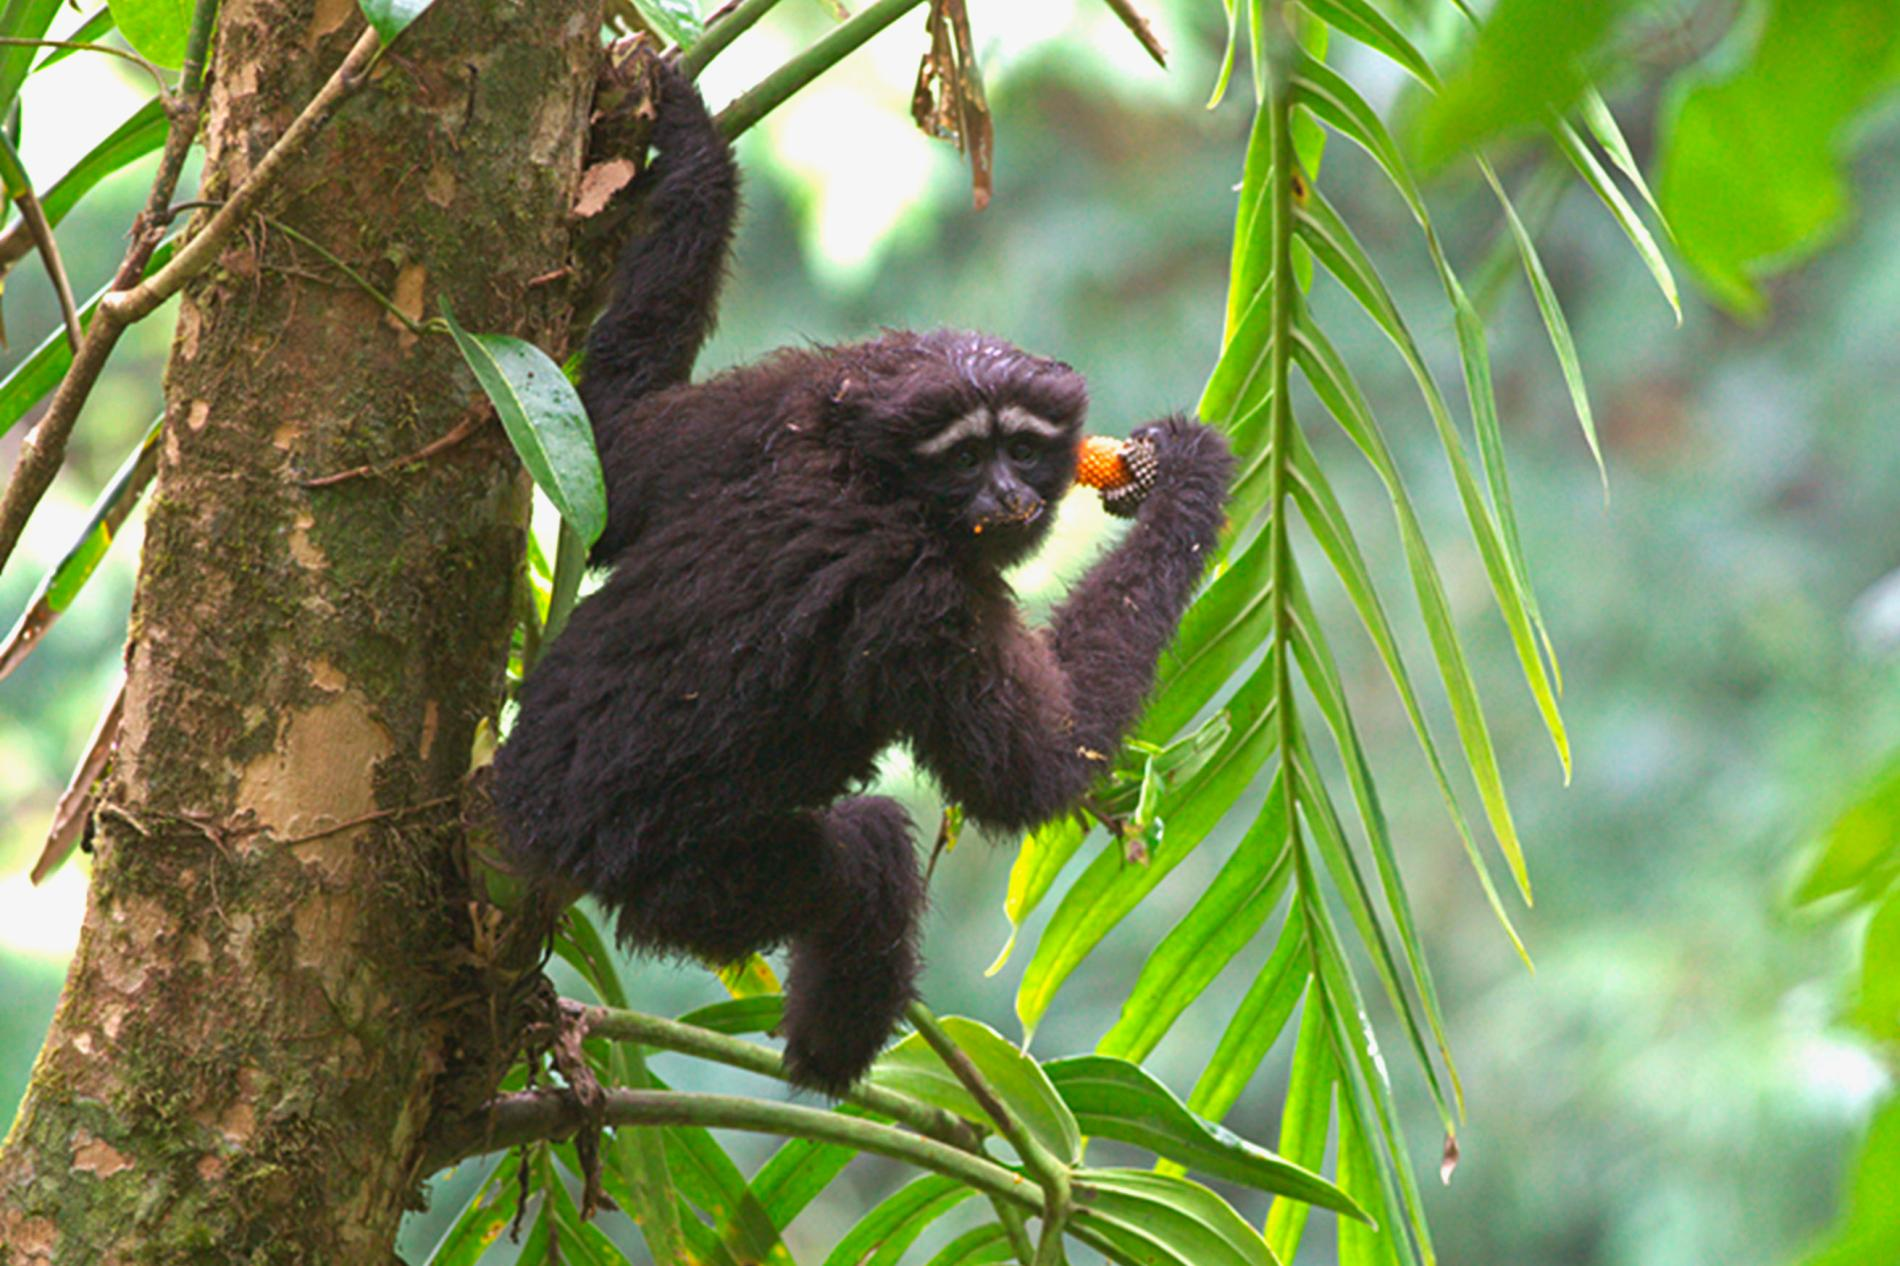 A Skywalker hoolock gibbon in its natural habitat.